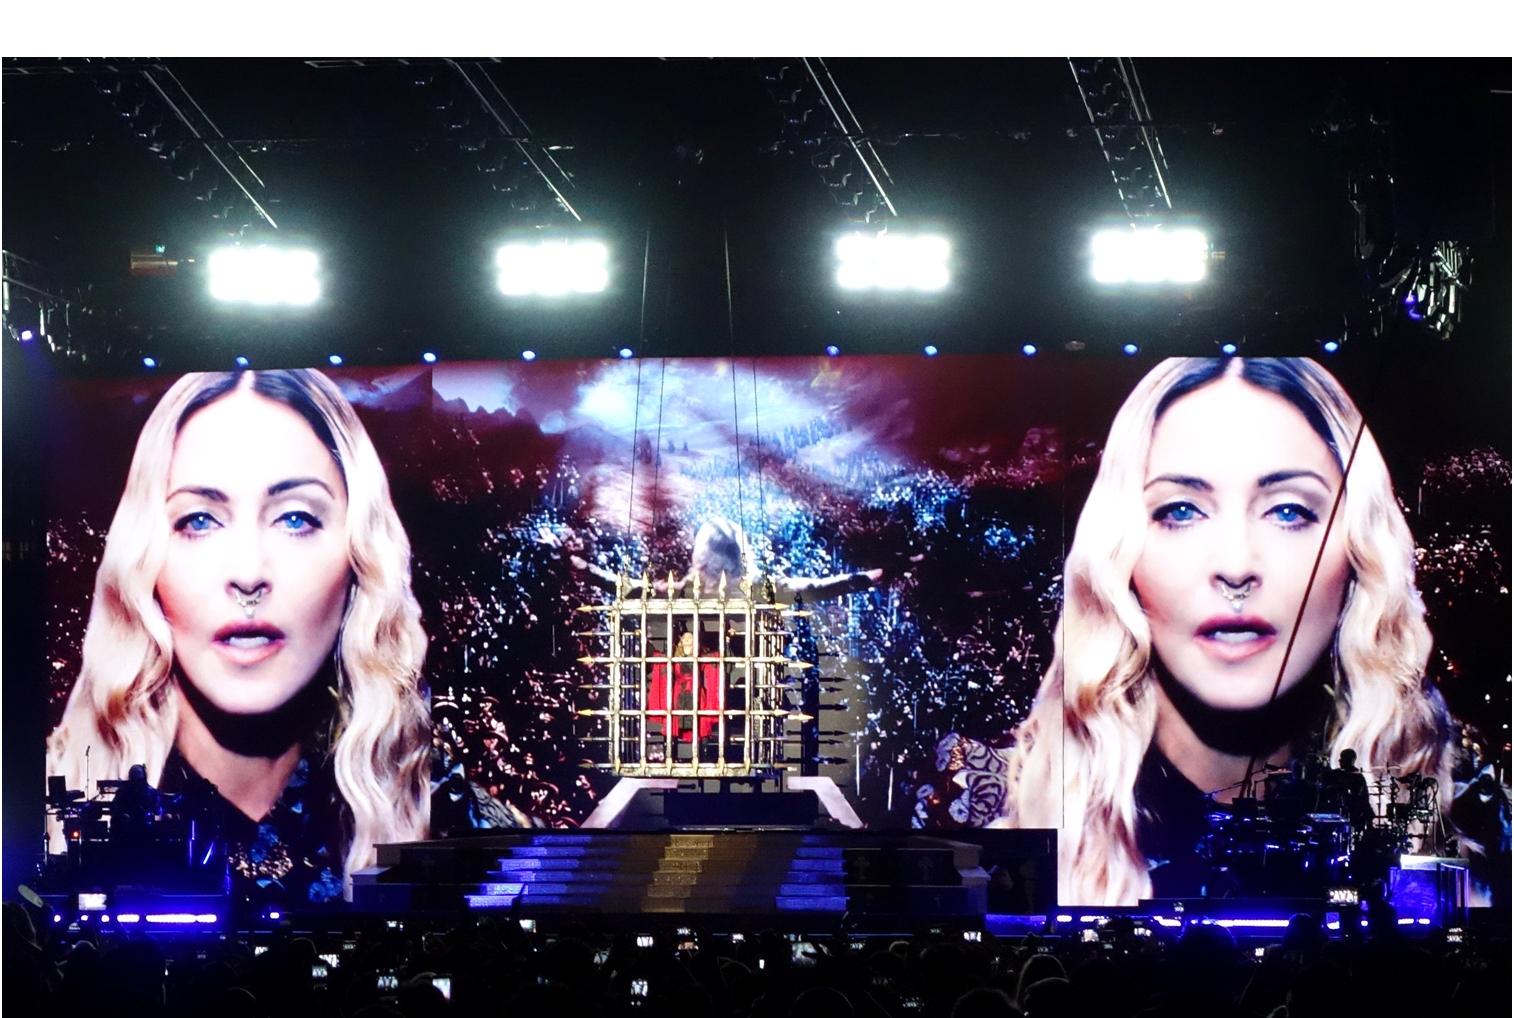 Madonna descending in a cage